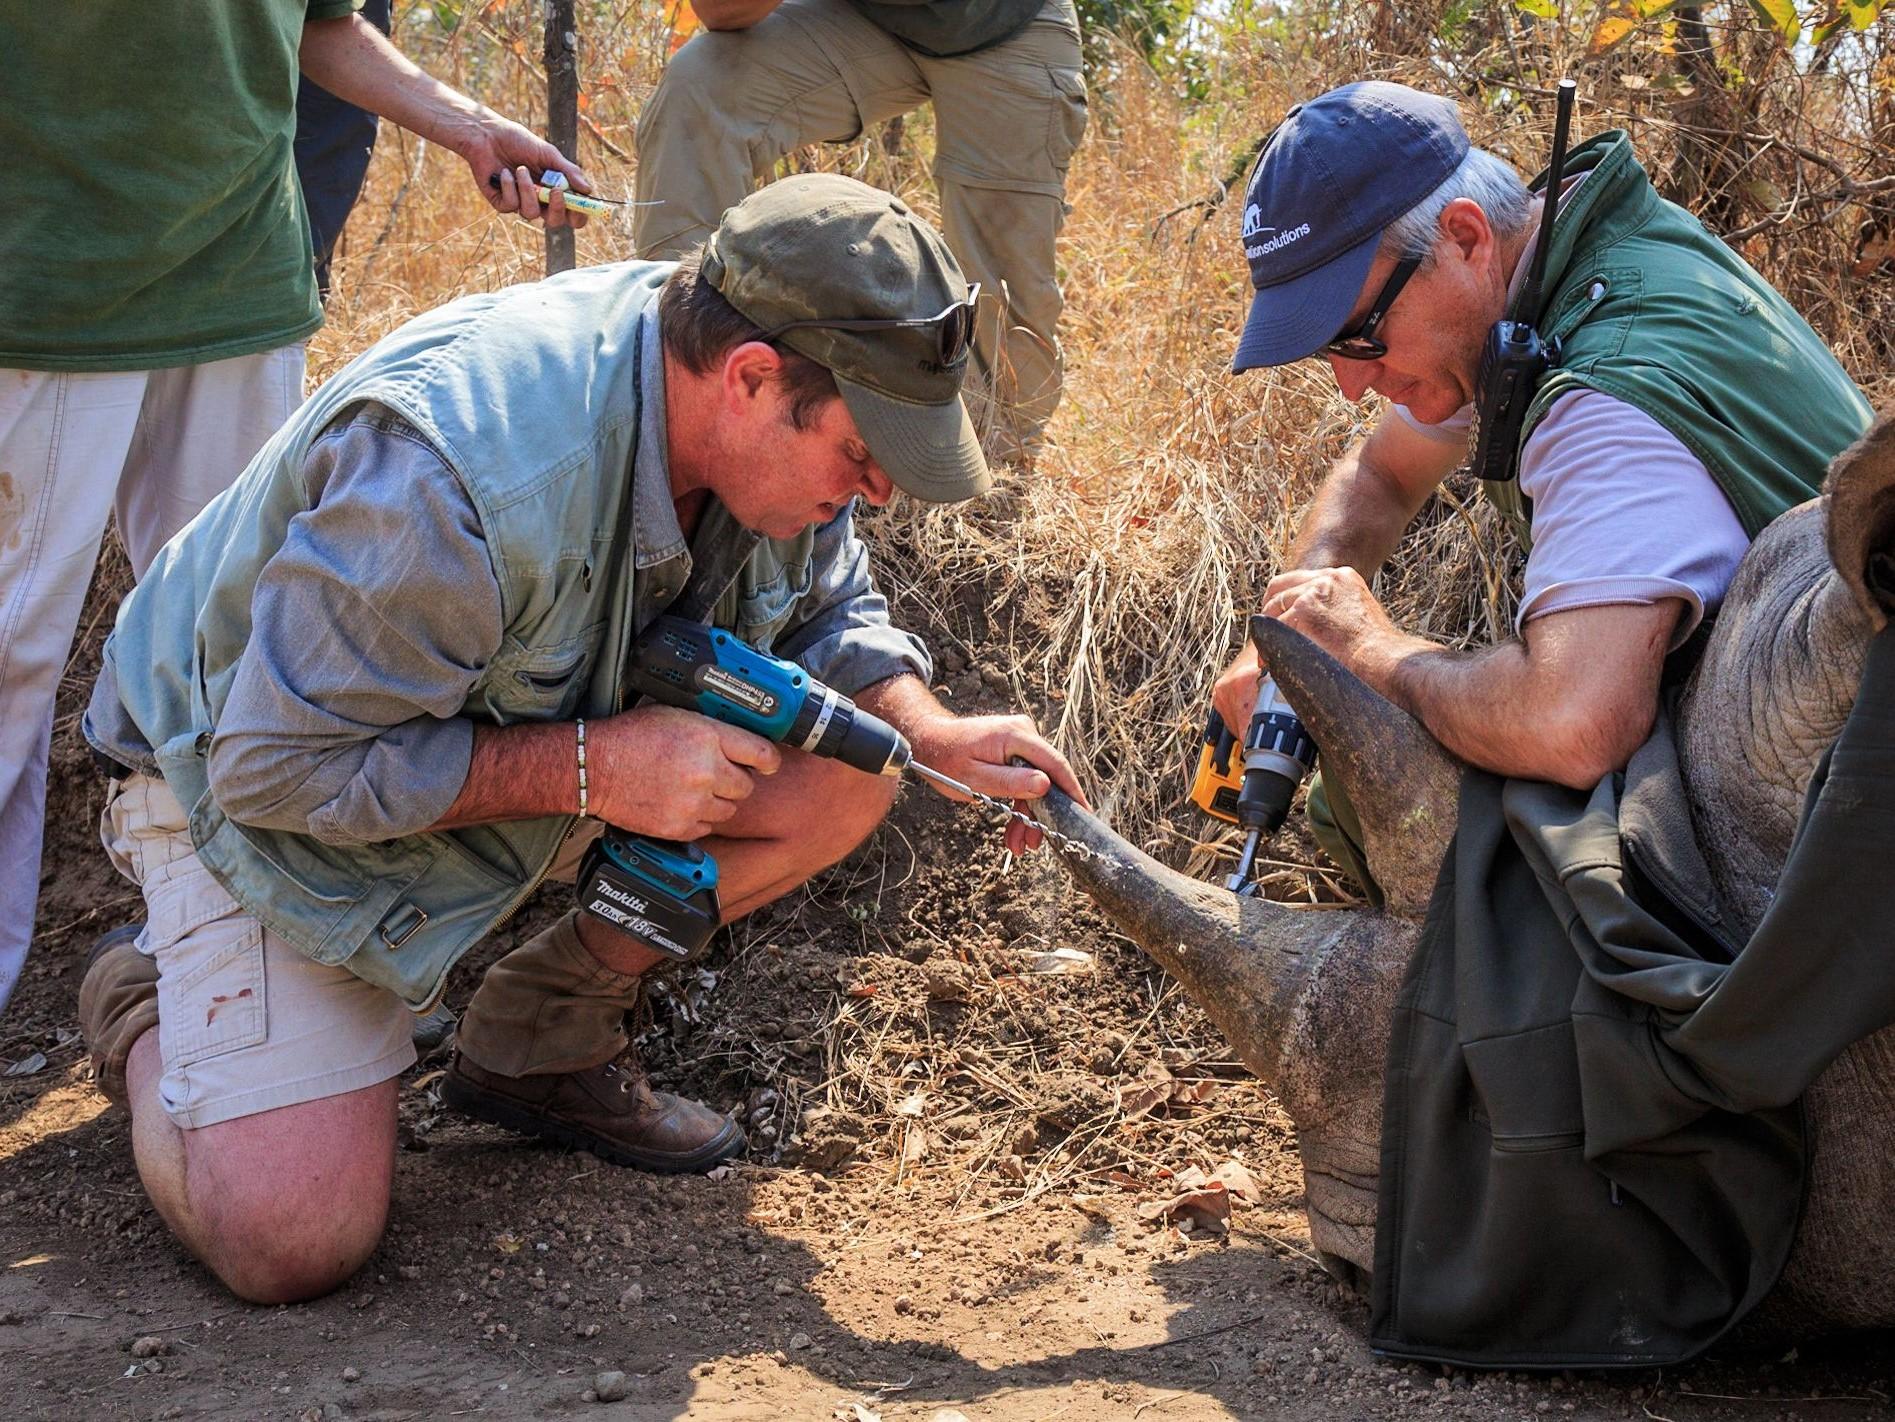 rhino conservation, marataba, reis neushoorn, marataba explorers camp, reis zuid-afrika